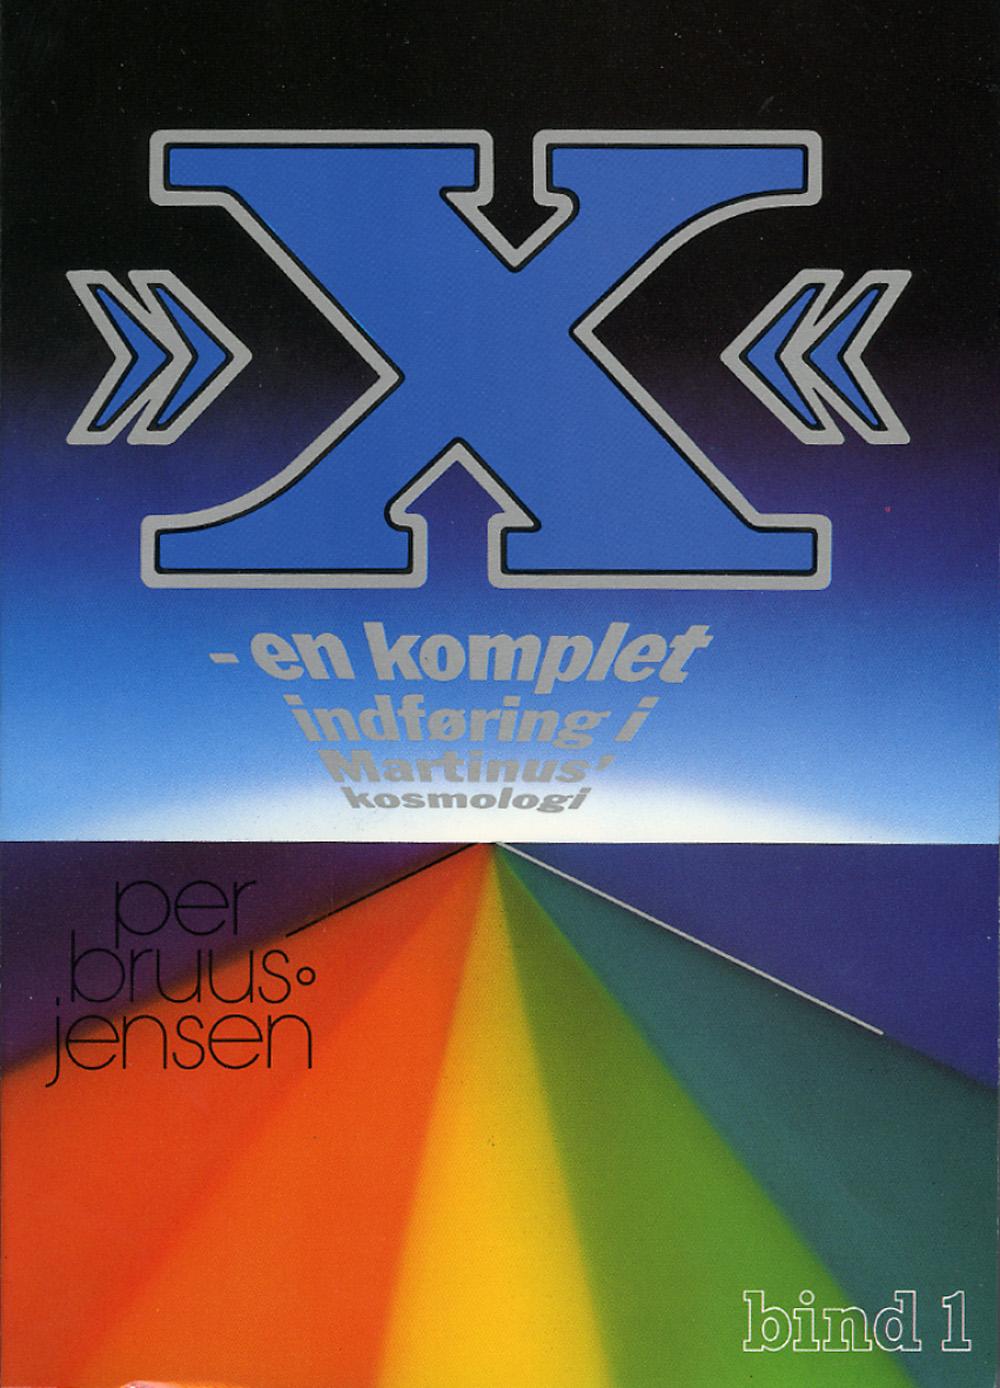 »X« : en komplet indføring i Martinus Kosmologi, 1 av 4 av Per Bruus-Jensen